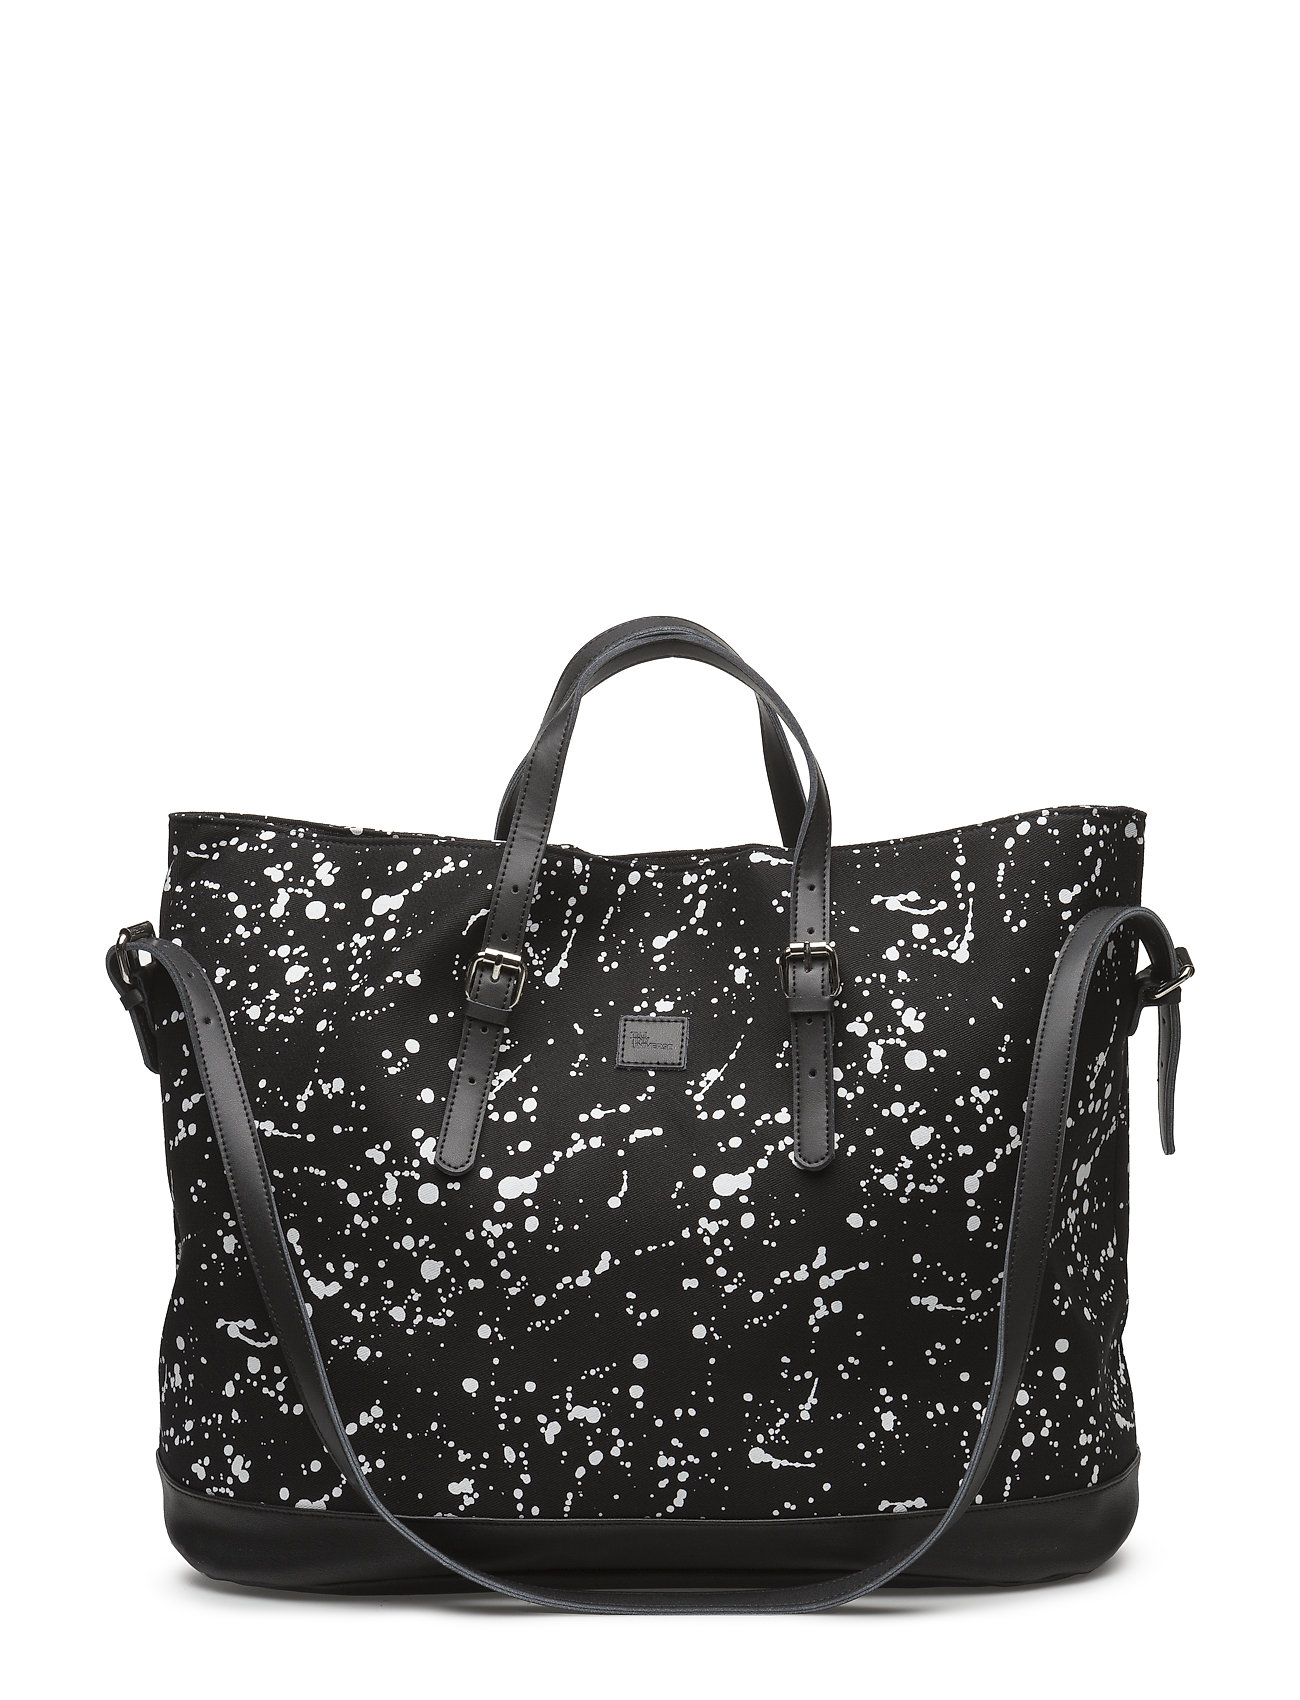 The Tiny Universe Urban Sherpa Bag